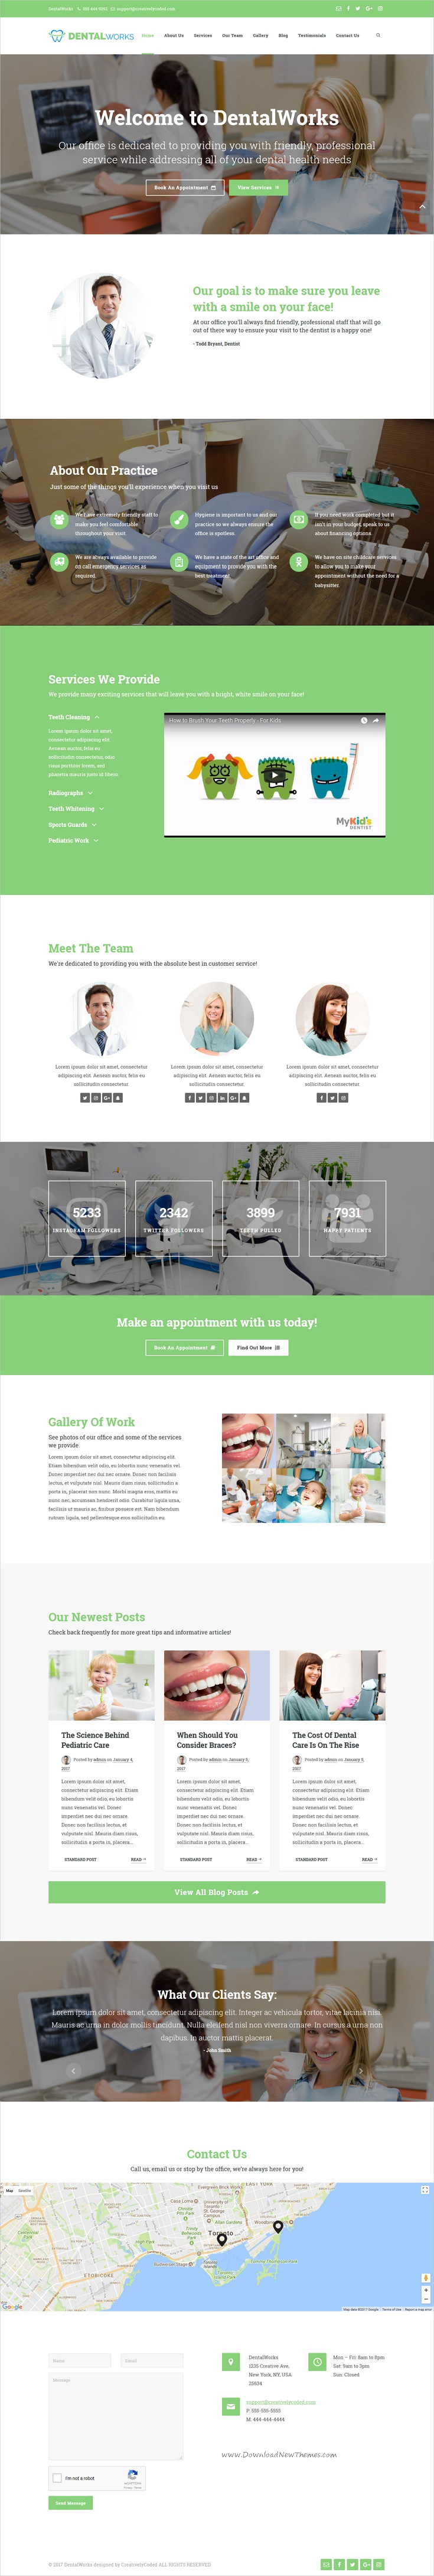 Logo Website Design Texas Dentist Tlc Pediatric Dentistry Dentist Branding Website Design Dental Design